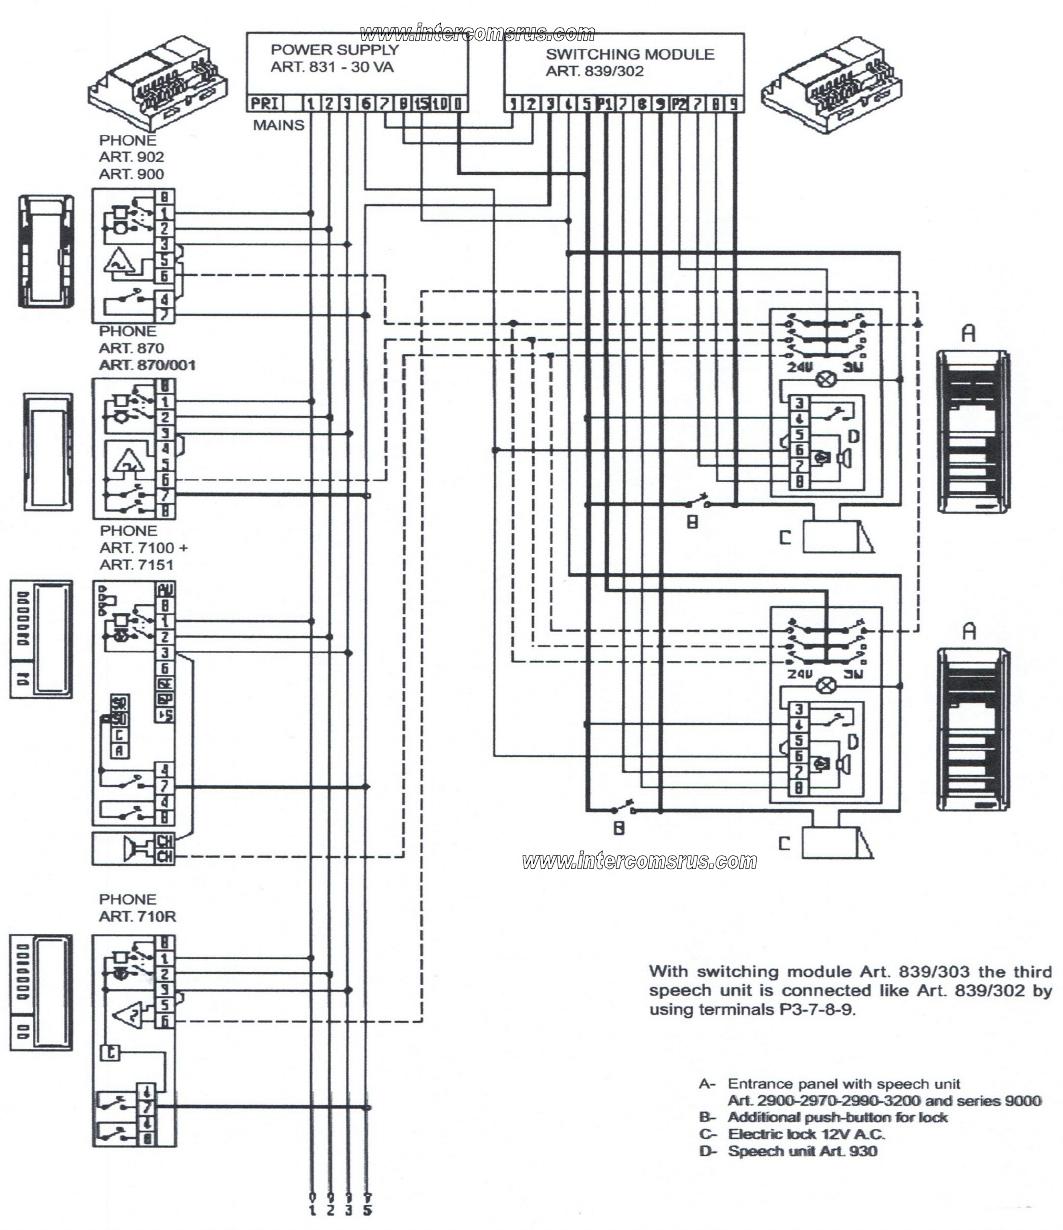 Elvox 8870 Intercom Handset Data Sheet Wiring Diagram For Case 930